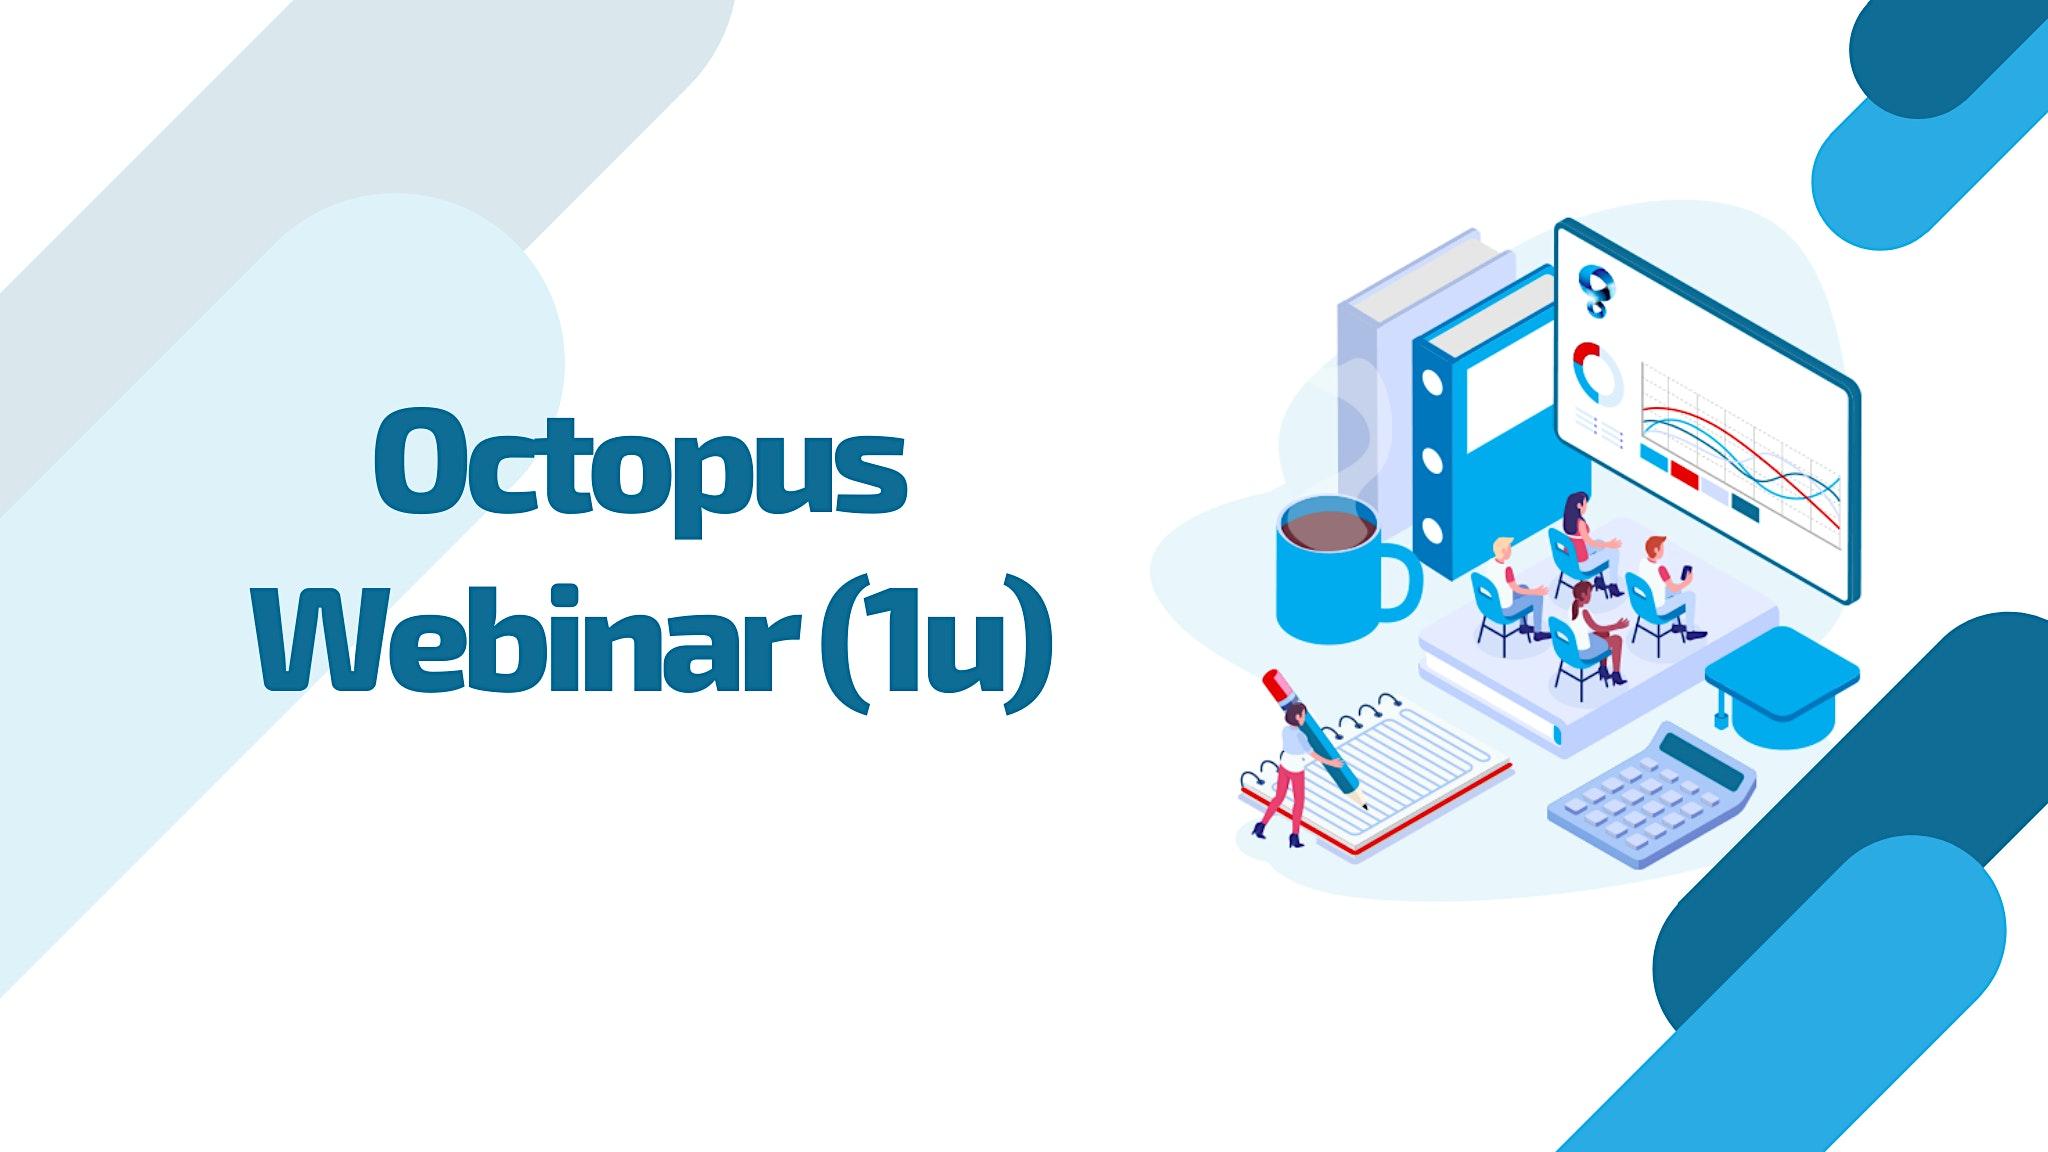 Octopus Webinar: Nieuwe gebruikers (focus op boekhouders)